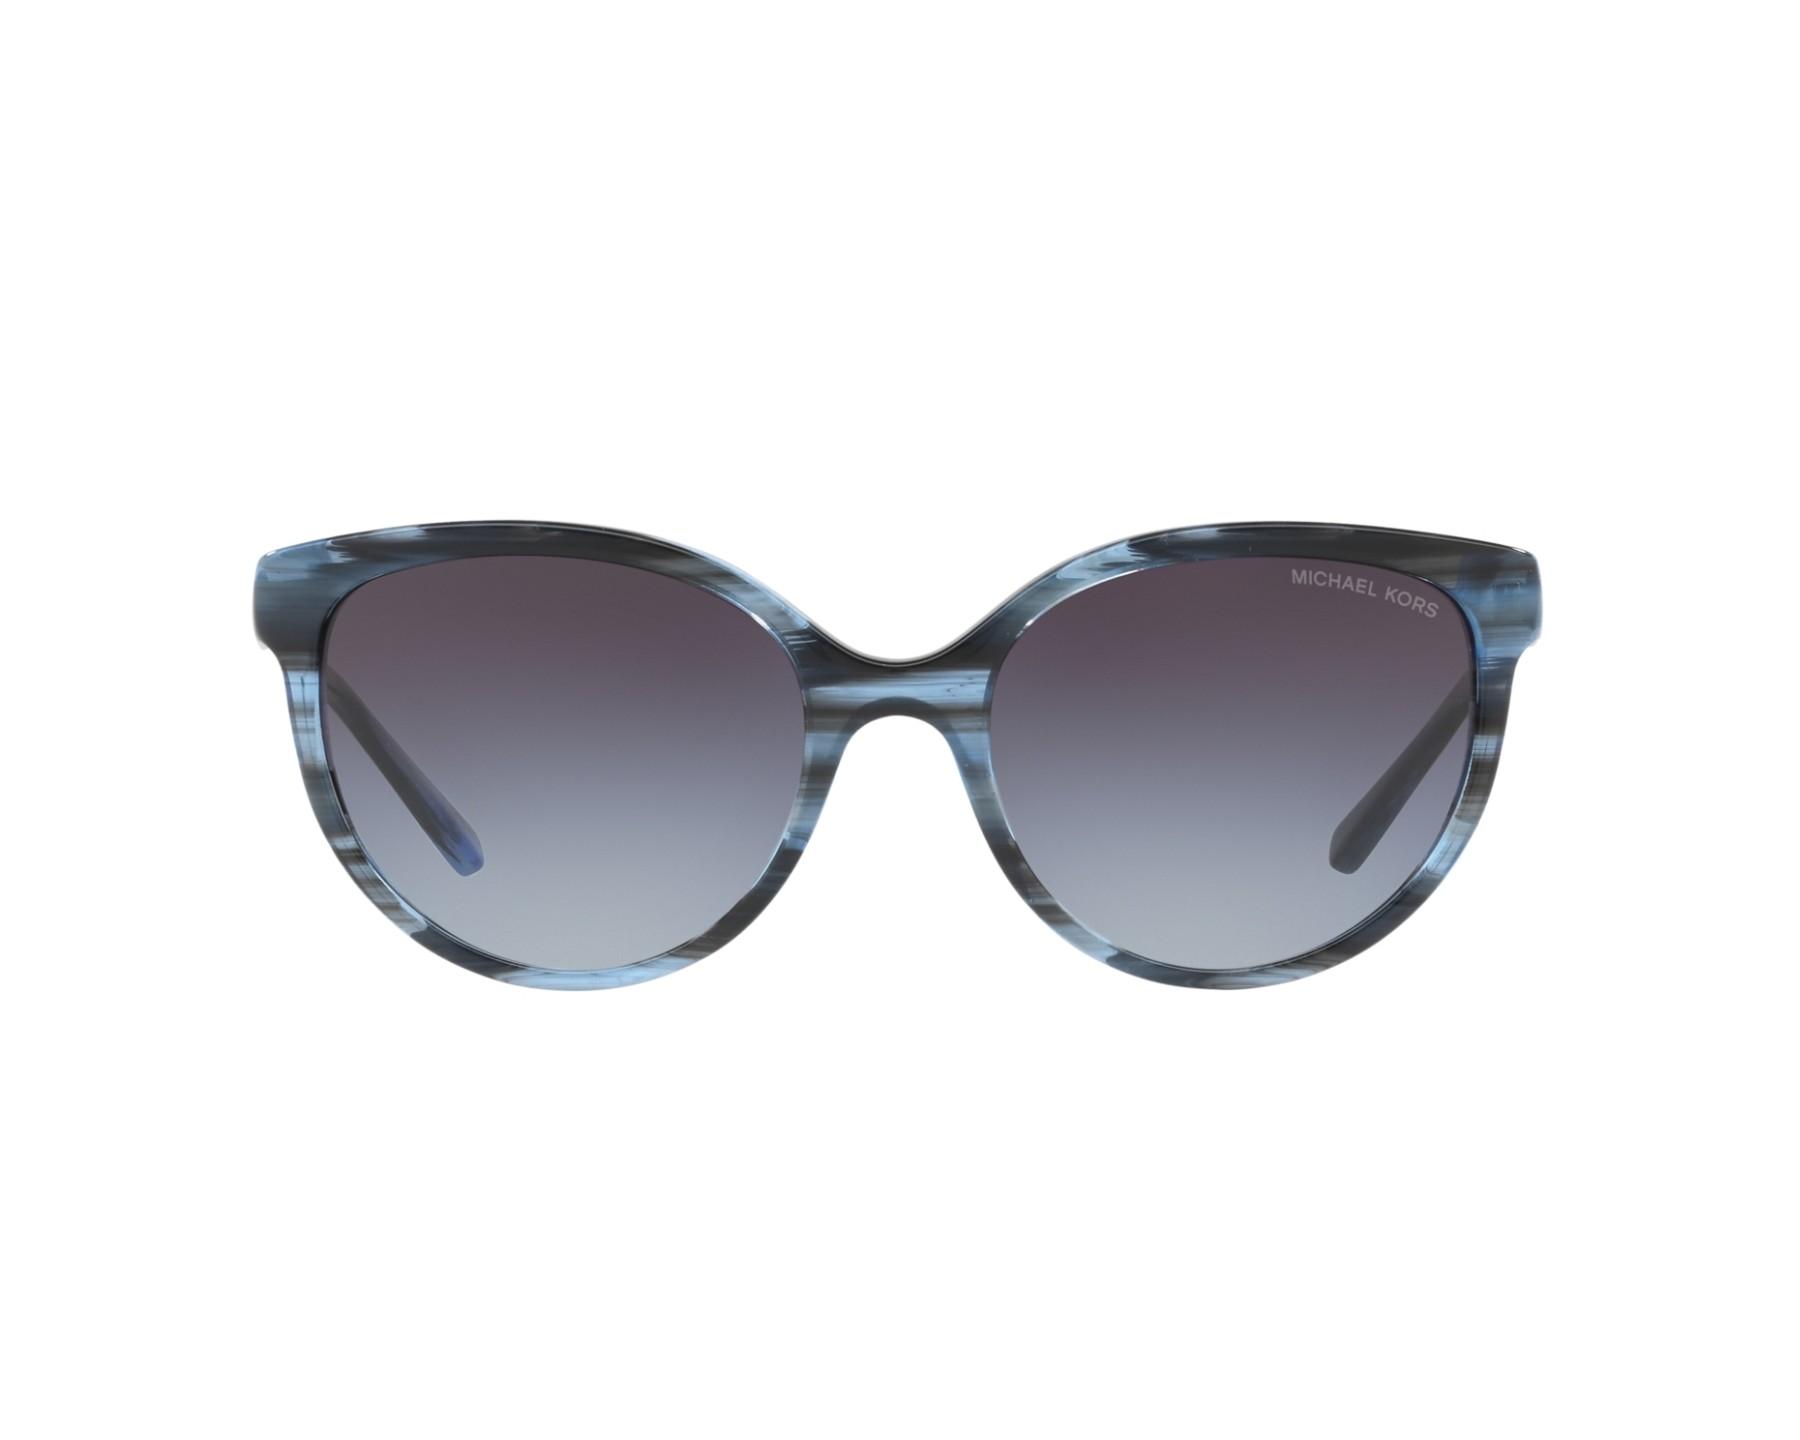 Sonnenbrille ABI (MK2052) Michael Kors pqGgR0vu